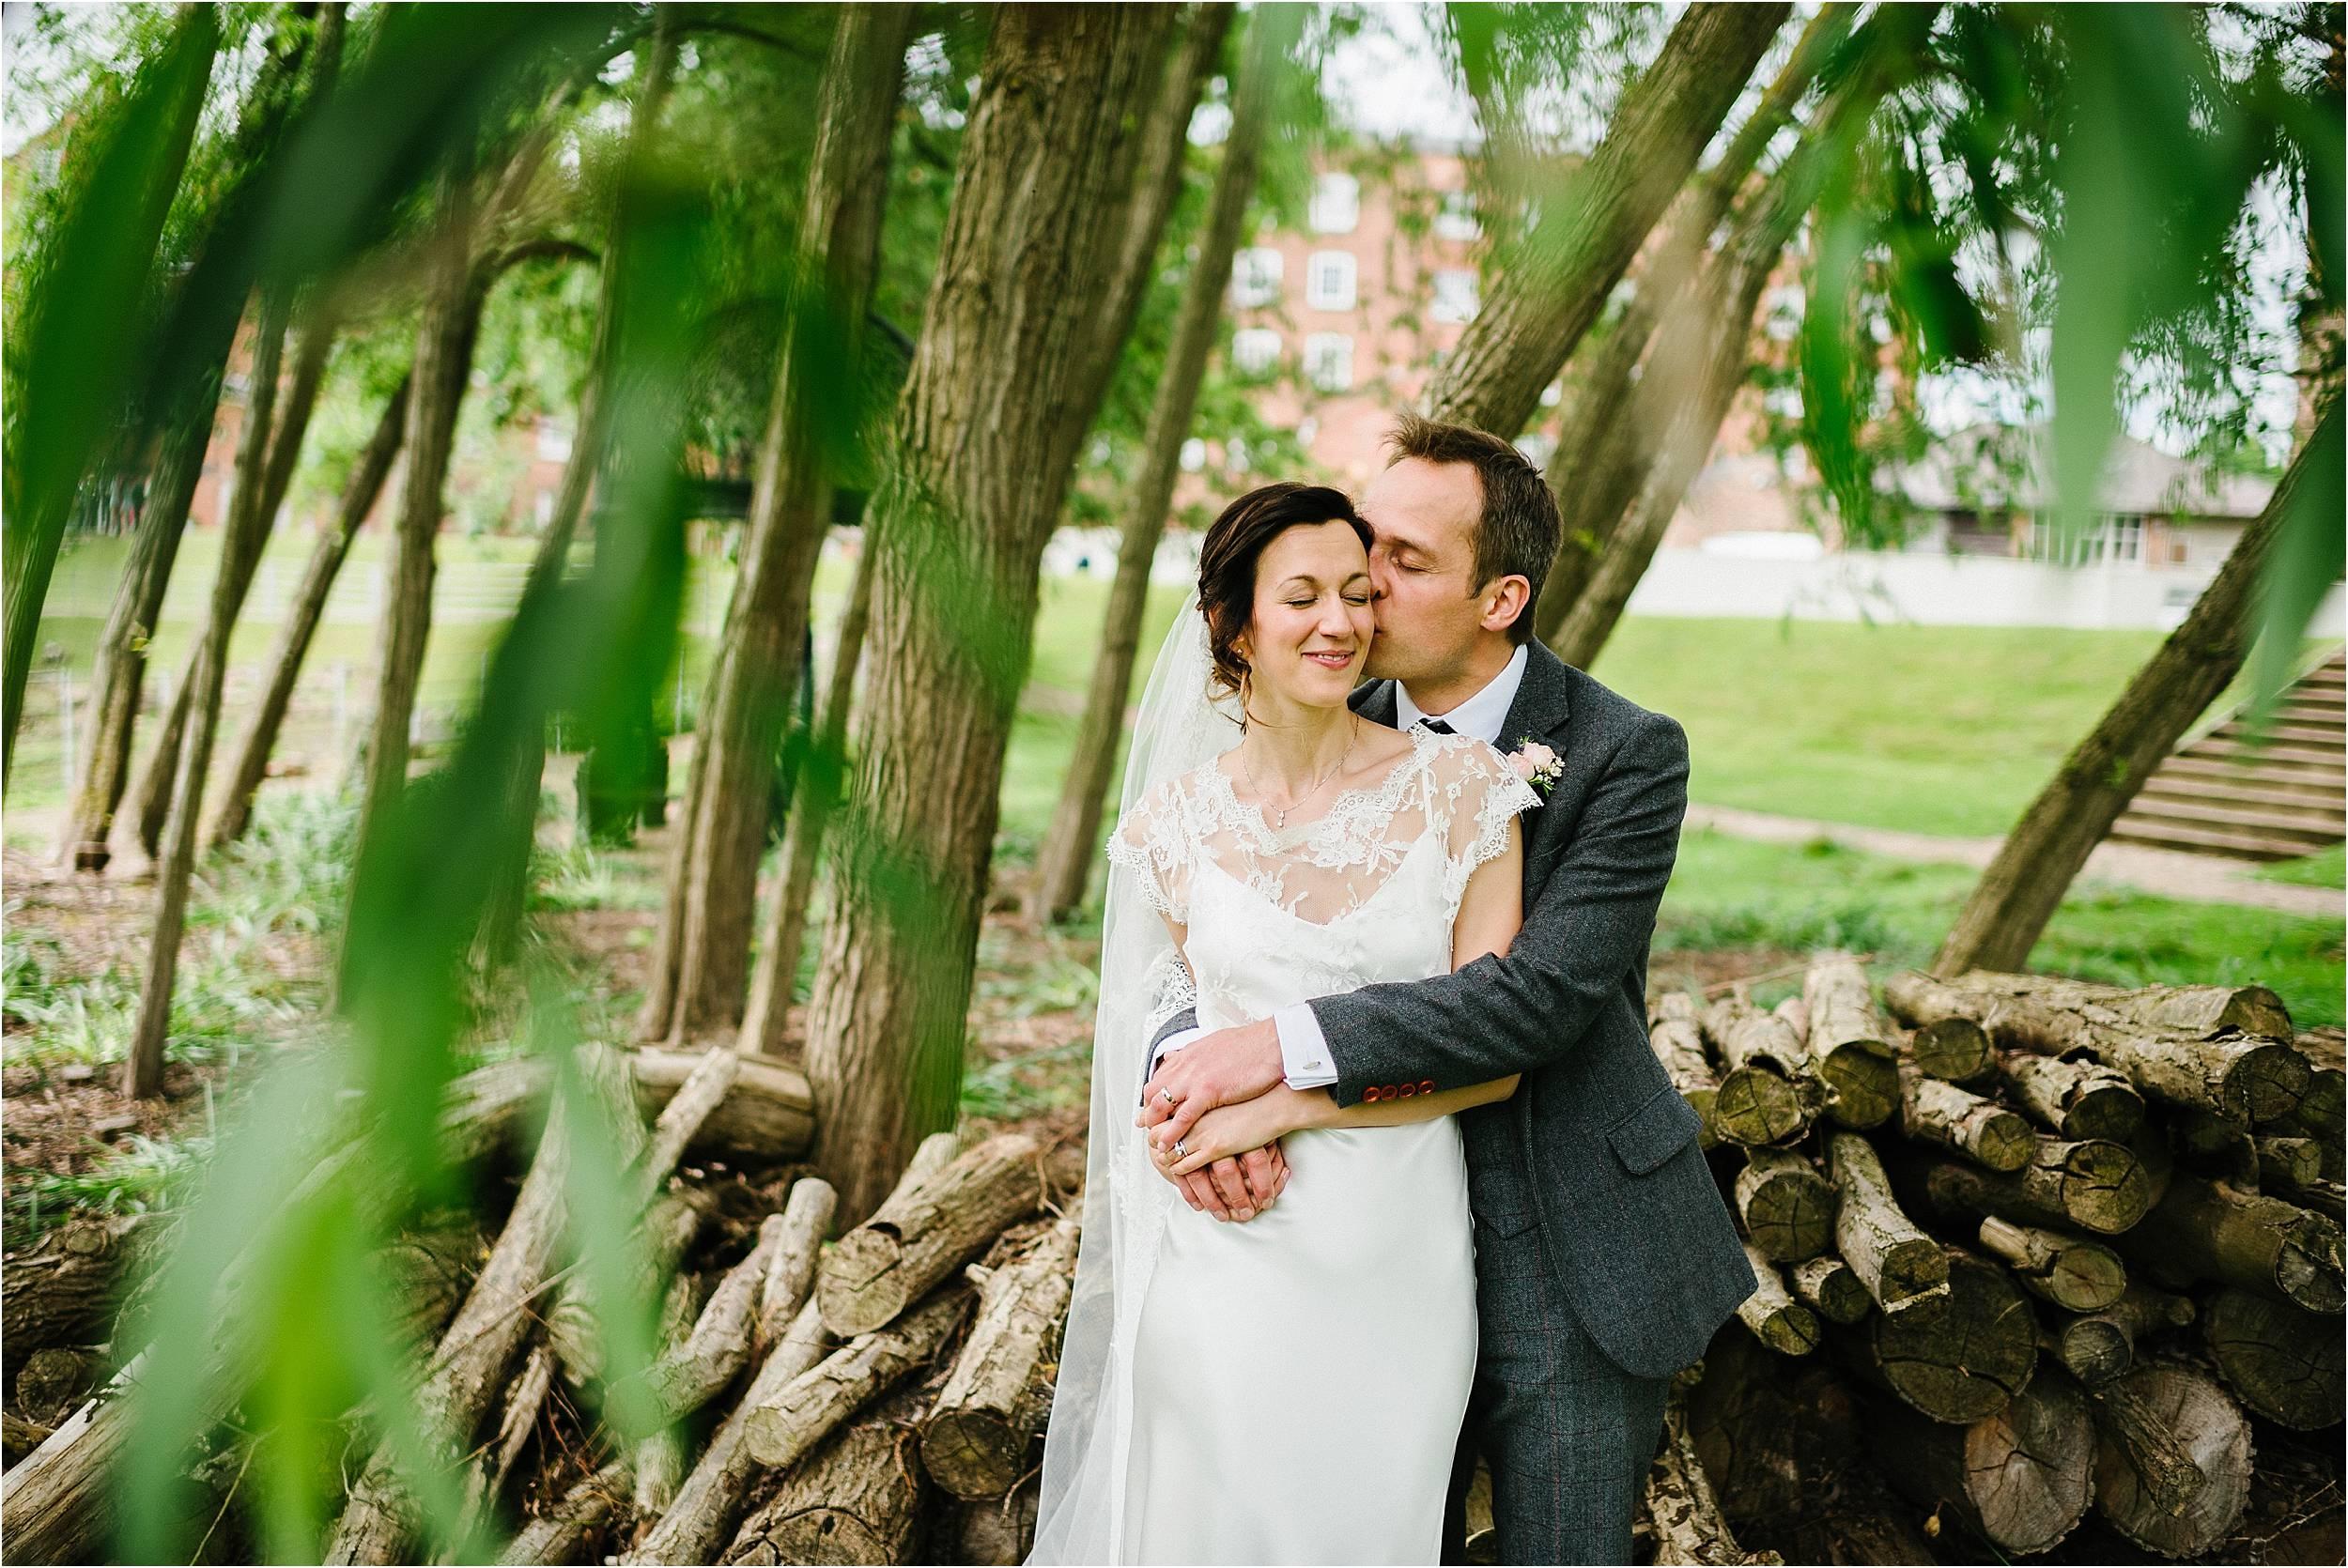 West Mill Derby Wedding Photographer_0152.jpg